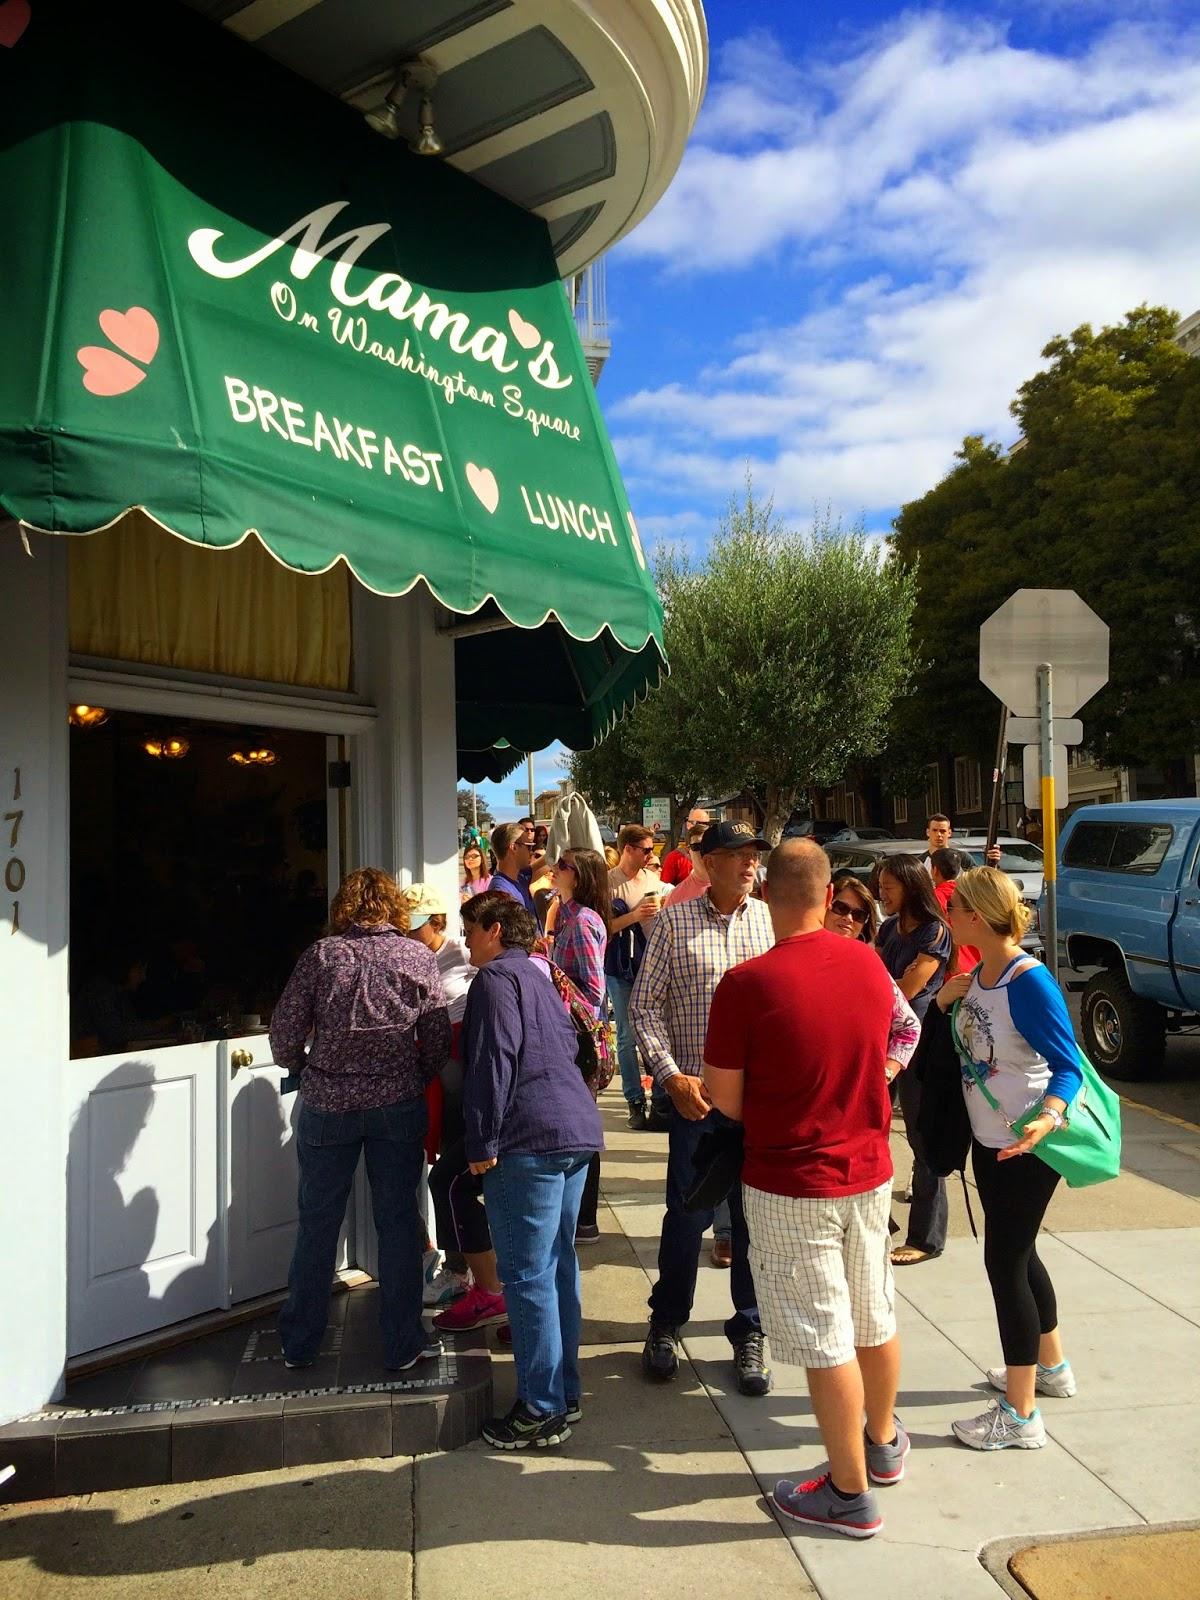 Hollywood Cafe North Point Street San Francisco Ca